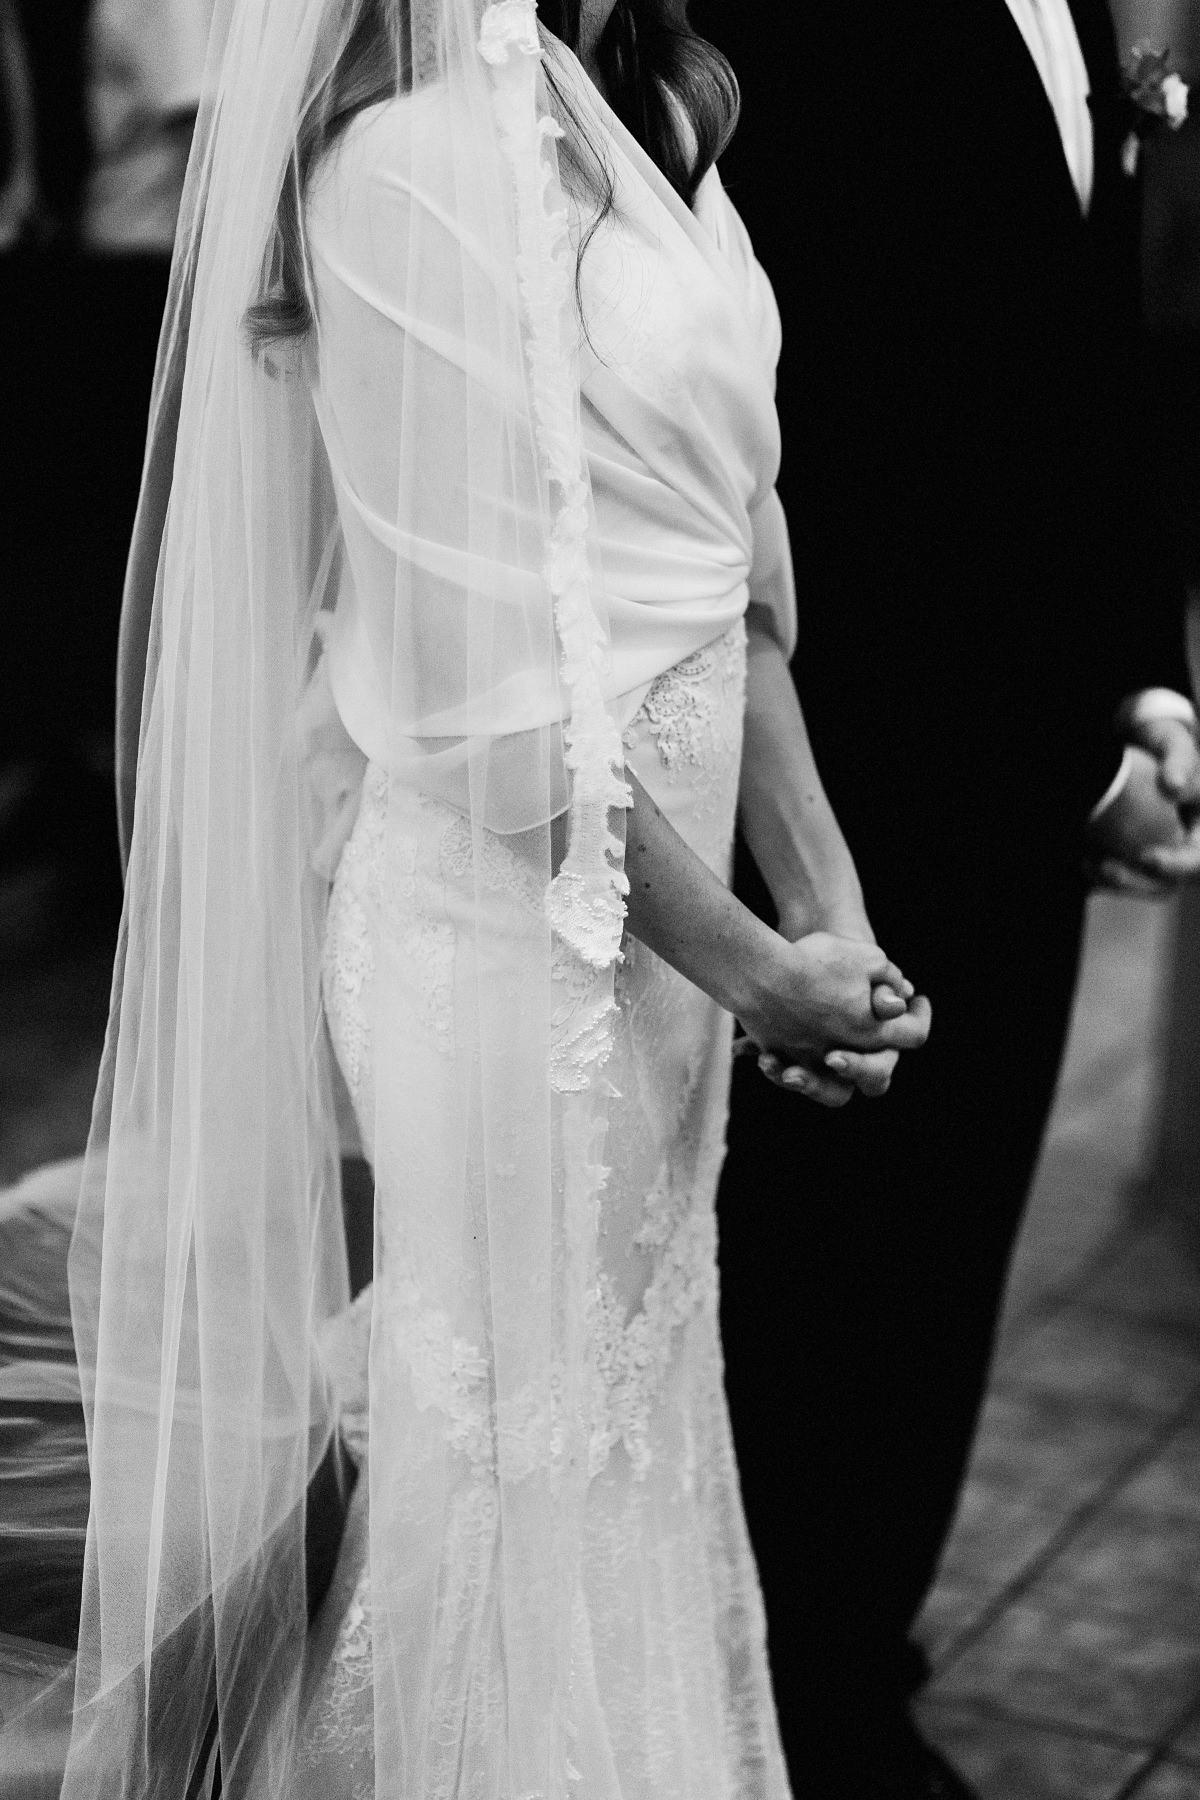 tin sedlar robert kale weddings royal bride ivana bilich